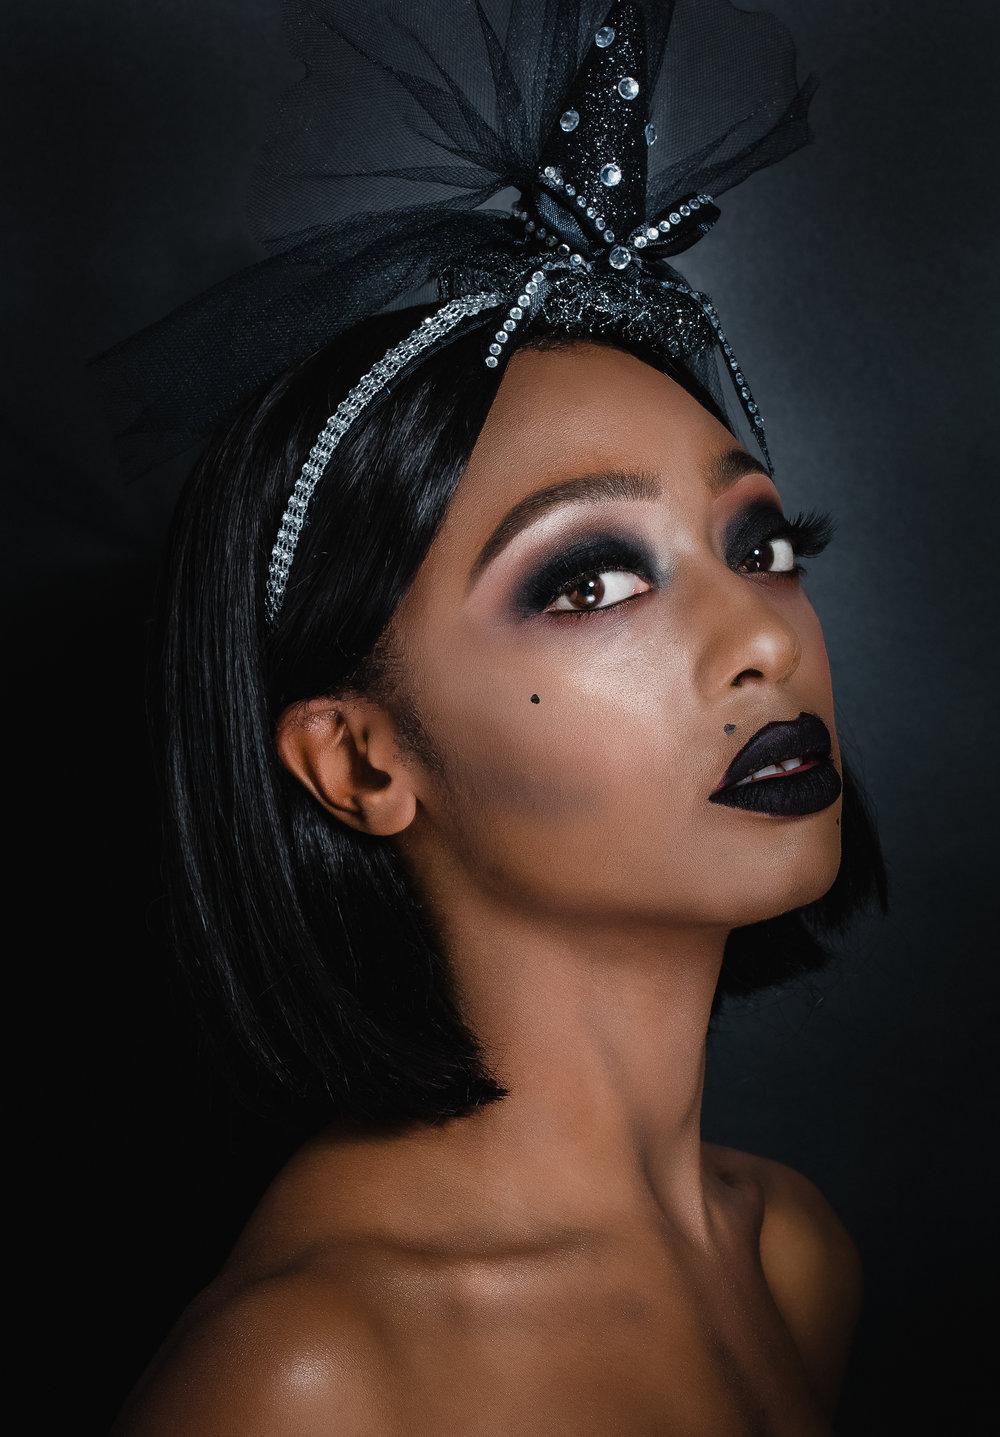 Photographer:  @jachristo /Retoucher:  @luisparradesign   Makeup:  @annaconnieeexmua   Model: @  ohsepi      Text:  @hahacaitlynhaha